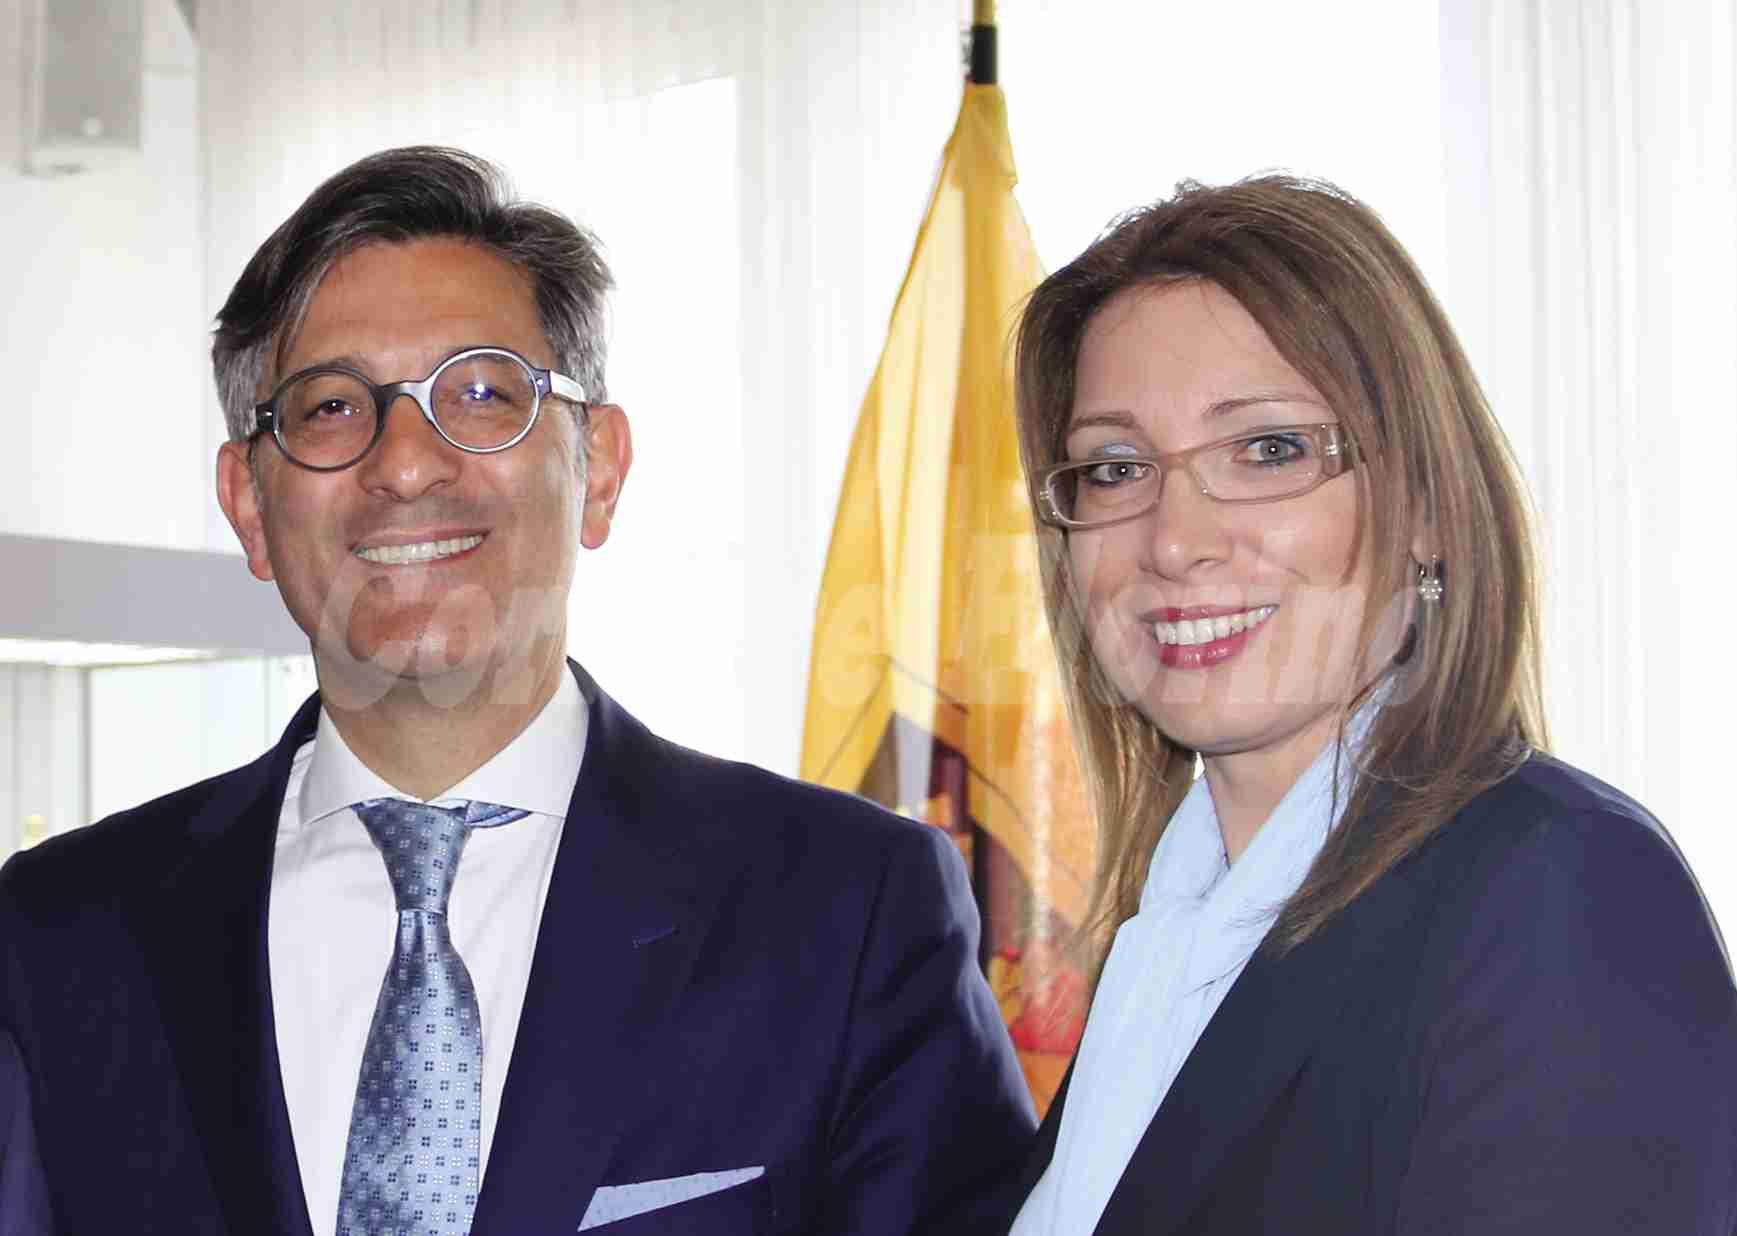 Oggi alle 12.30, conferenza stampa del sindaco Calvo e Cinzia Giallongo